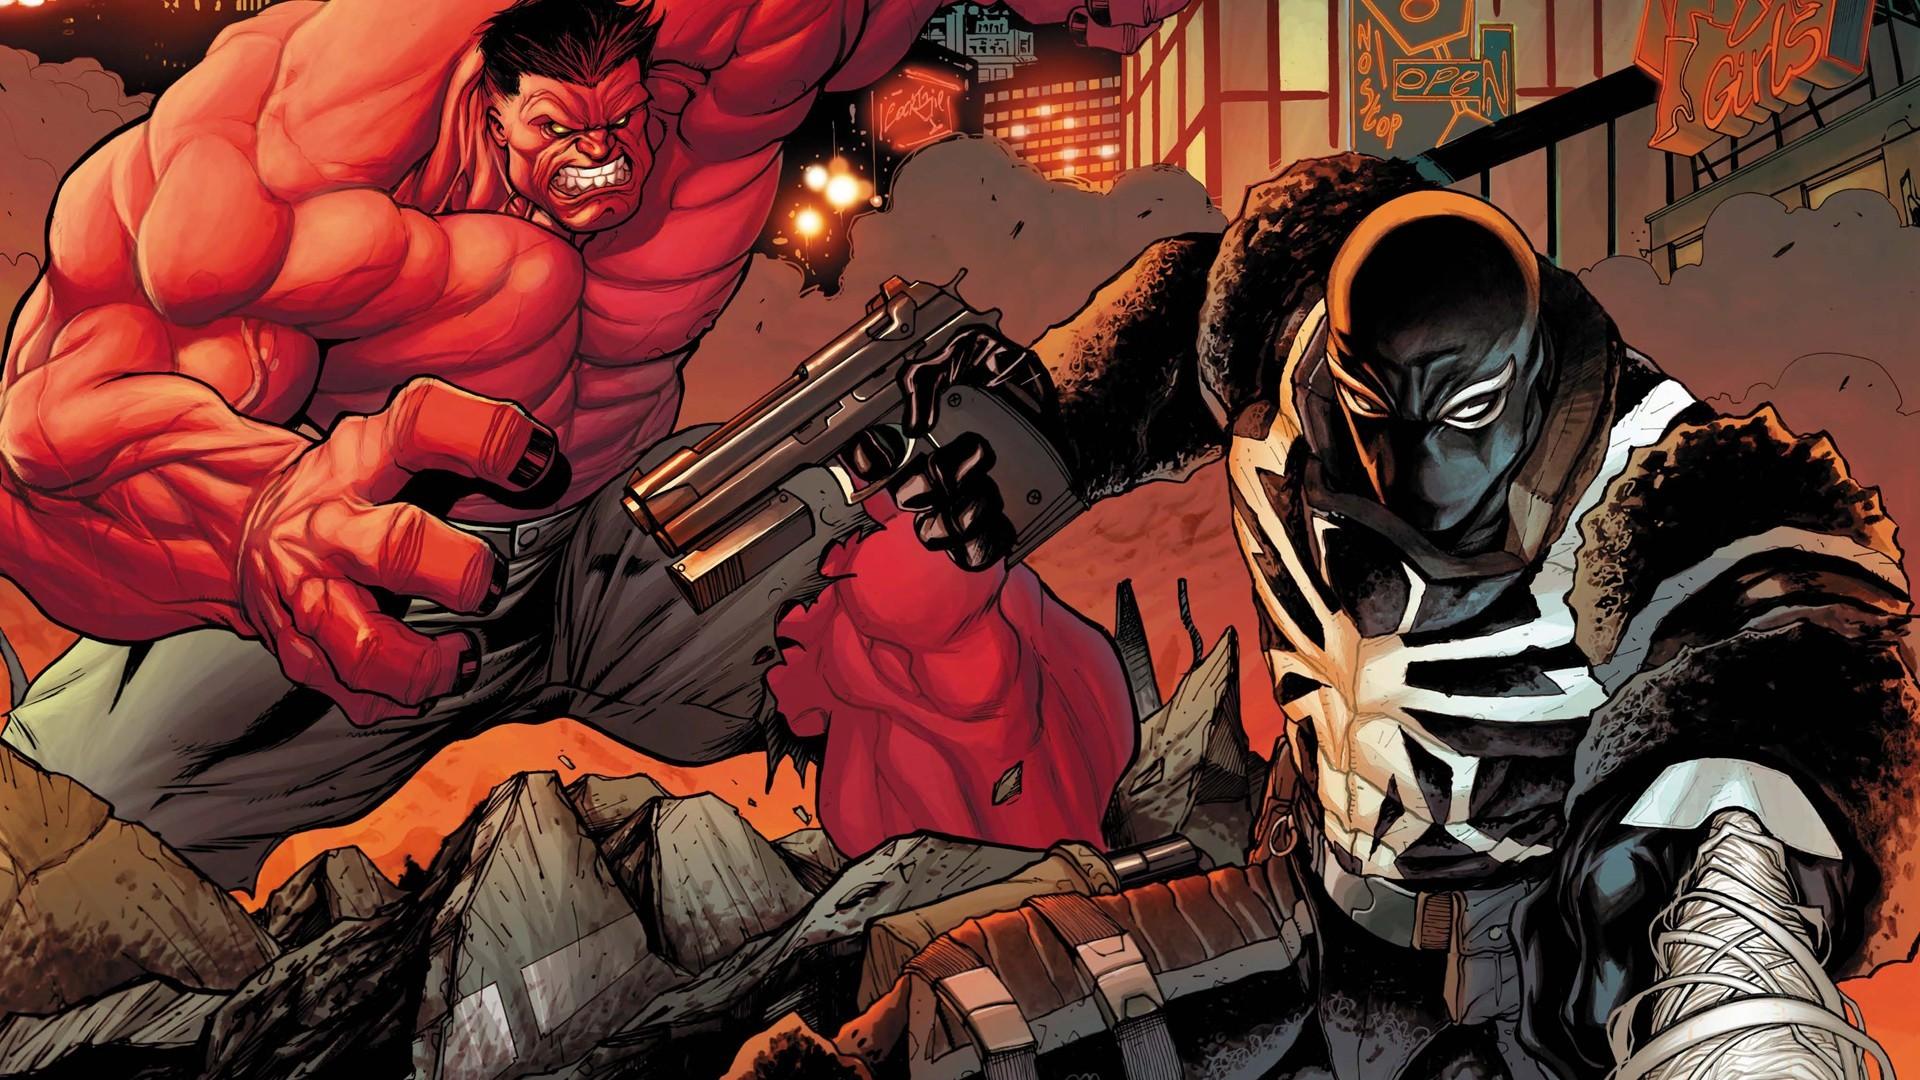 Res: 1920x1080, Comics Venom Red Hulk Thunderbolts wallpaper |  | 73871 |  WallpaperUP